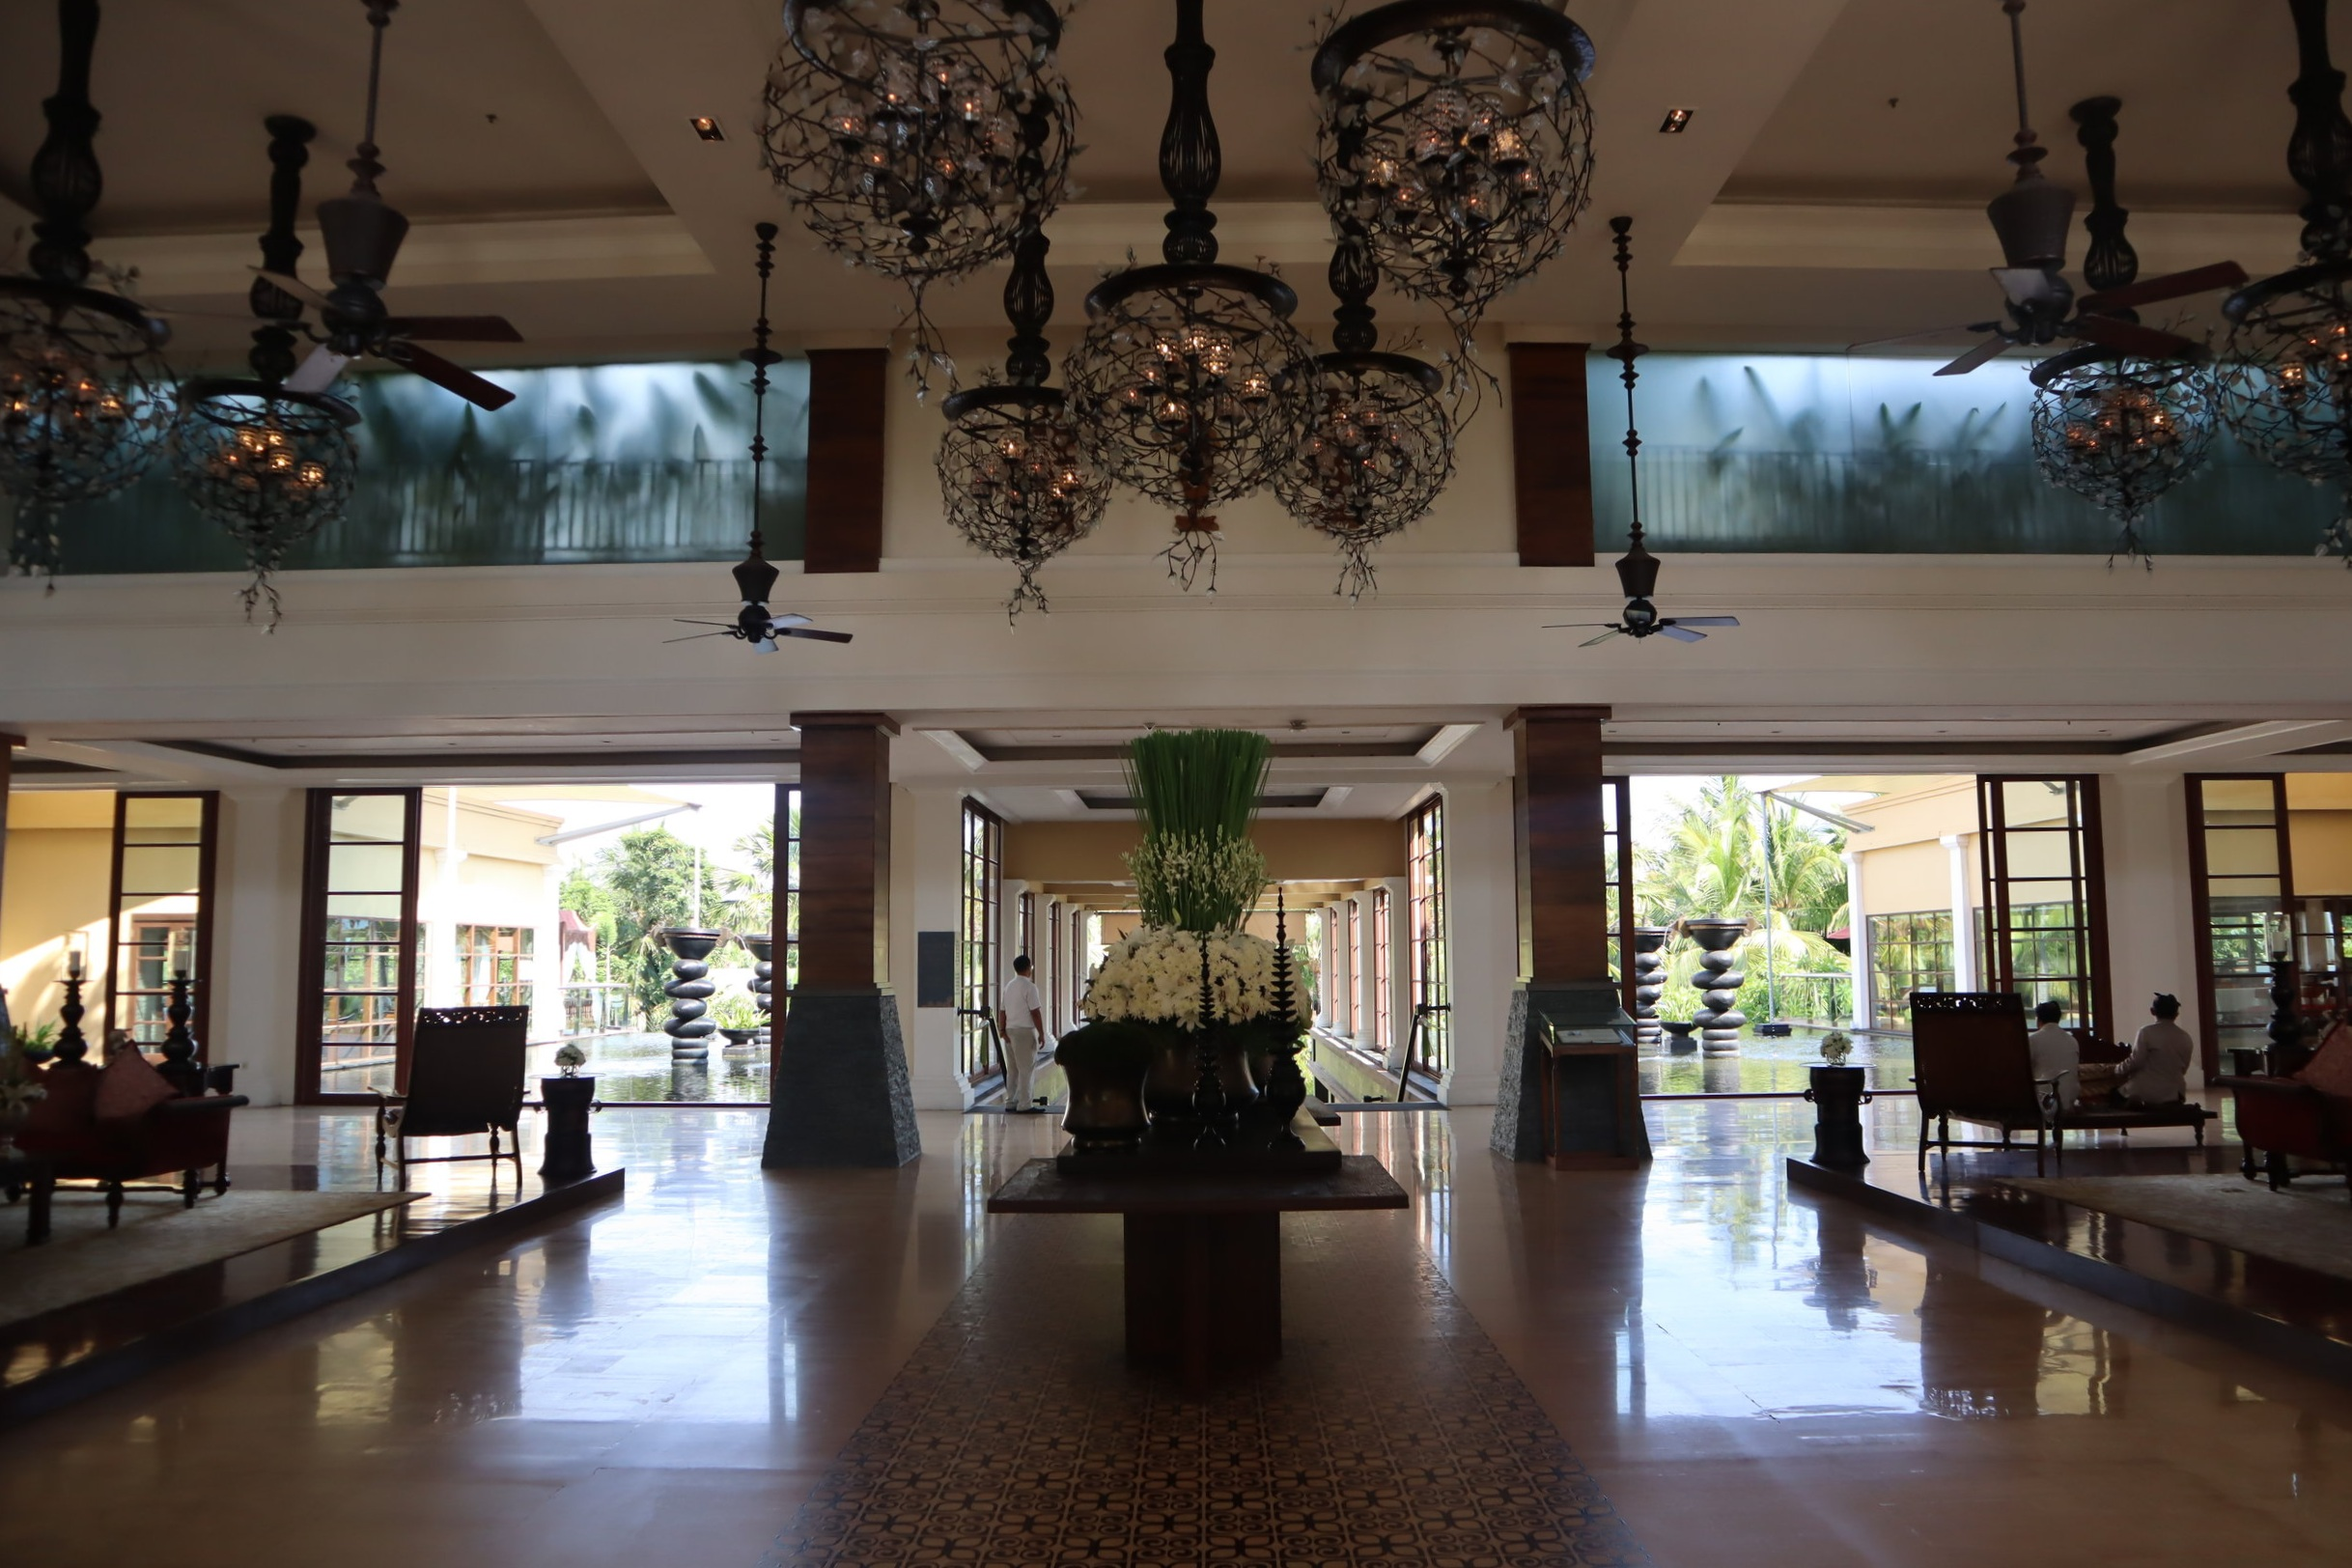 St. Regis Bali – Lobby